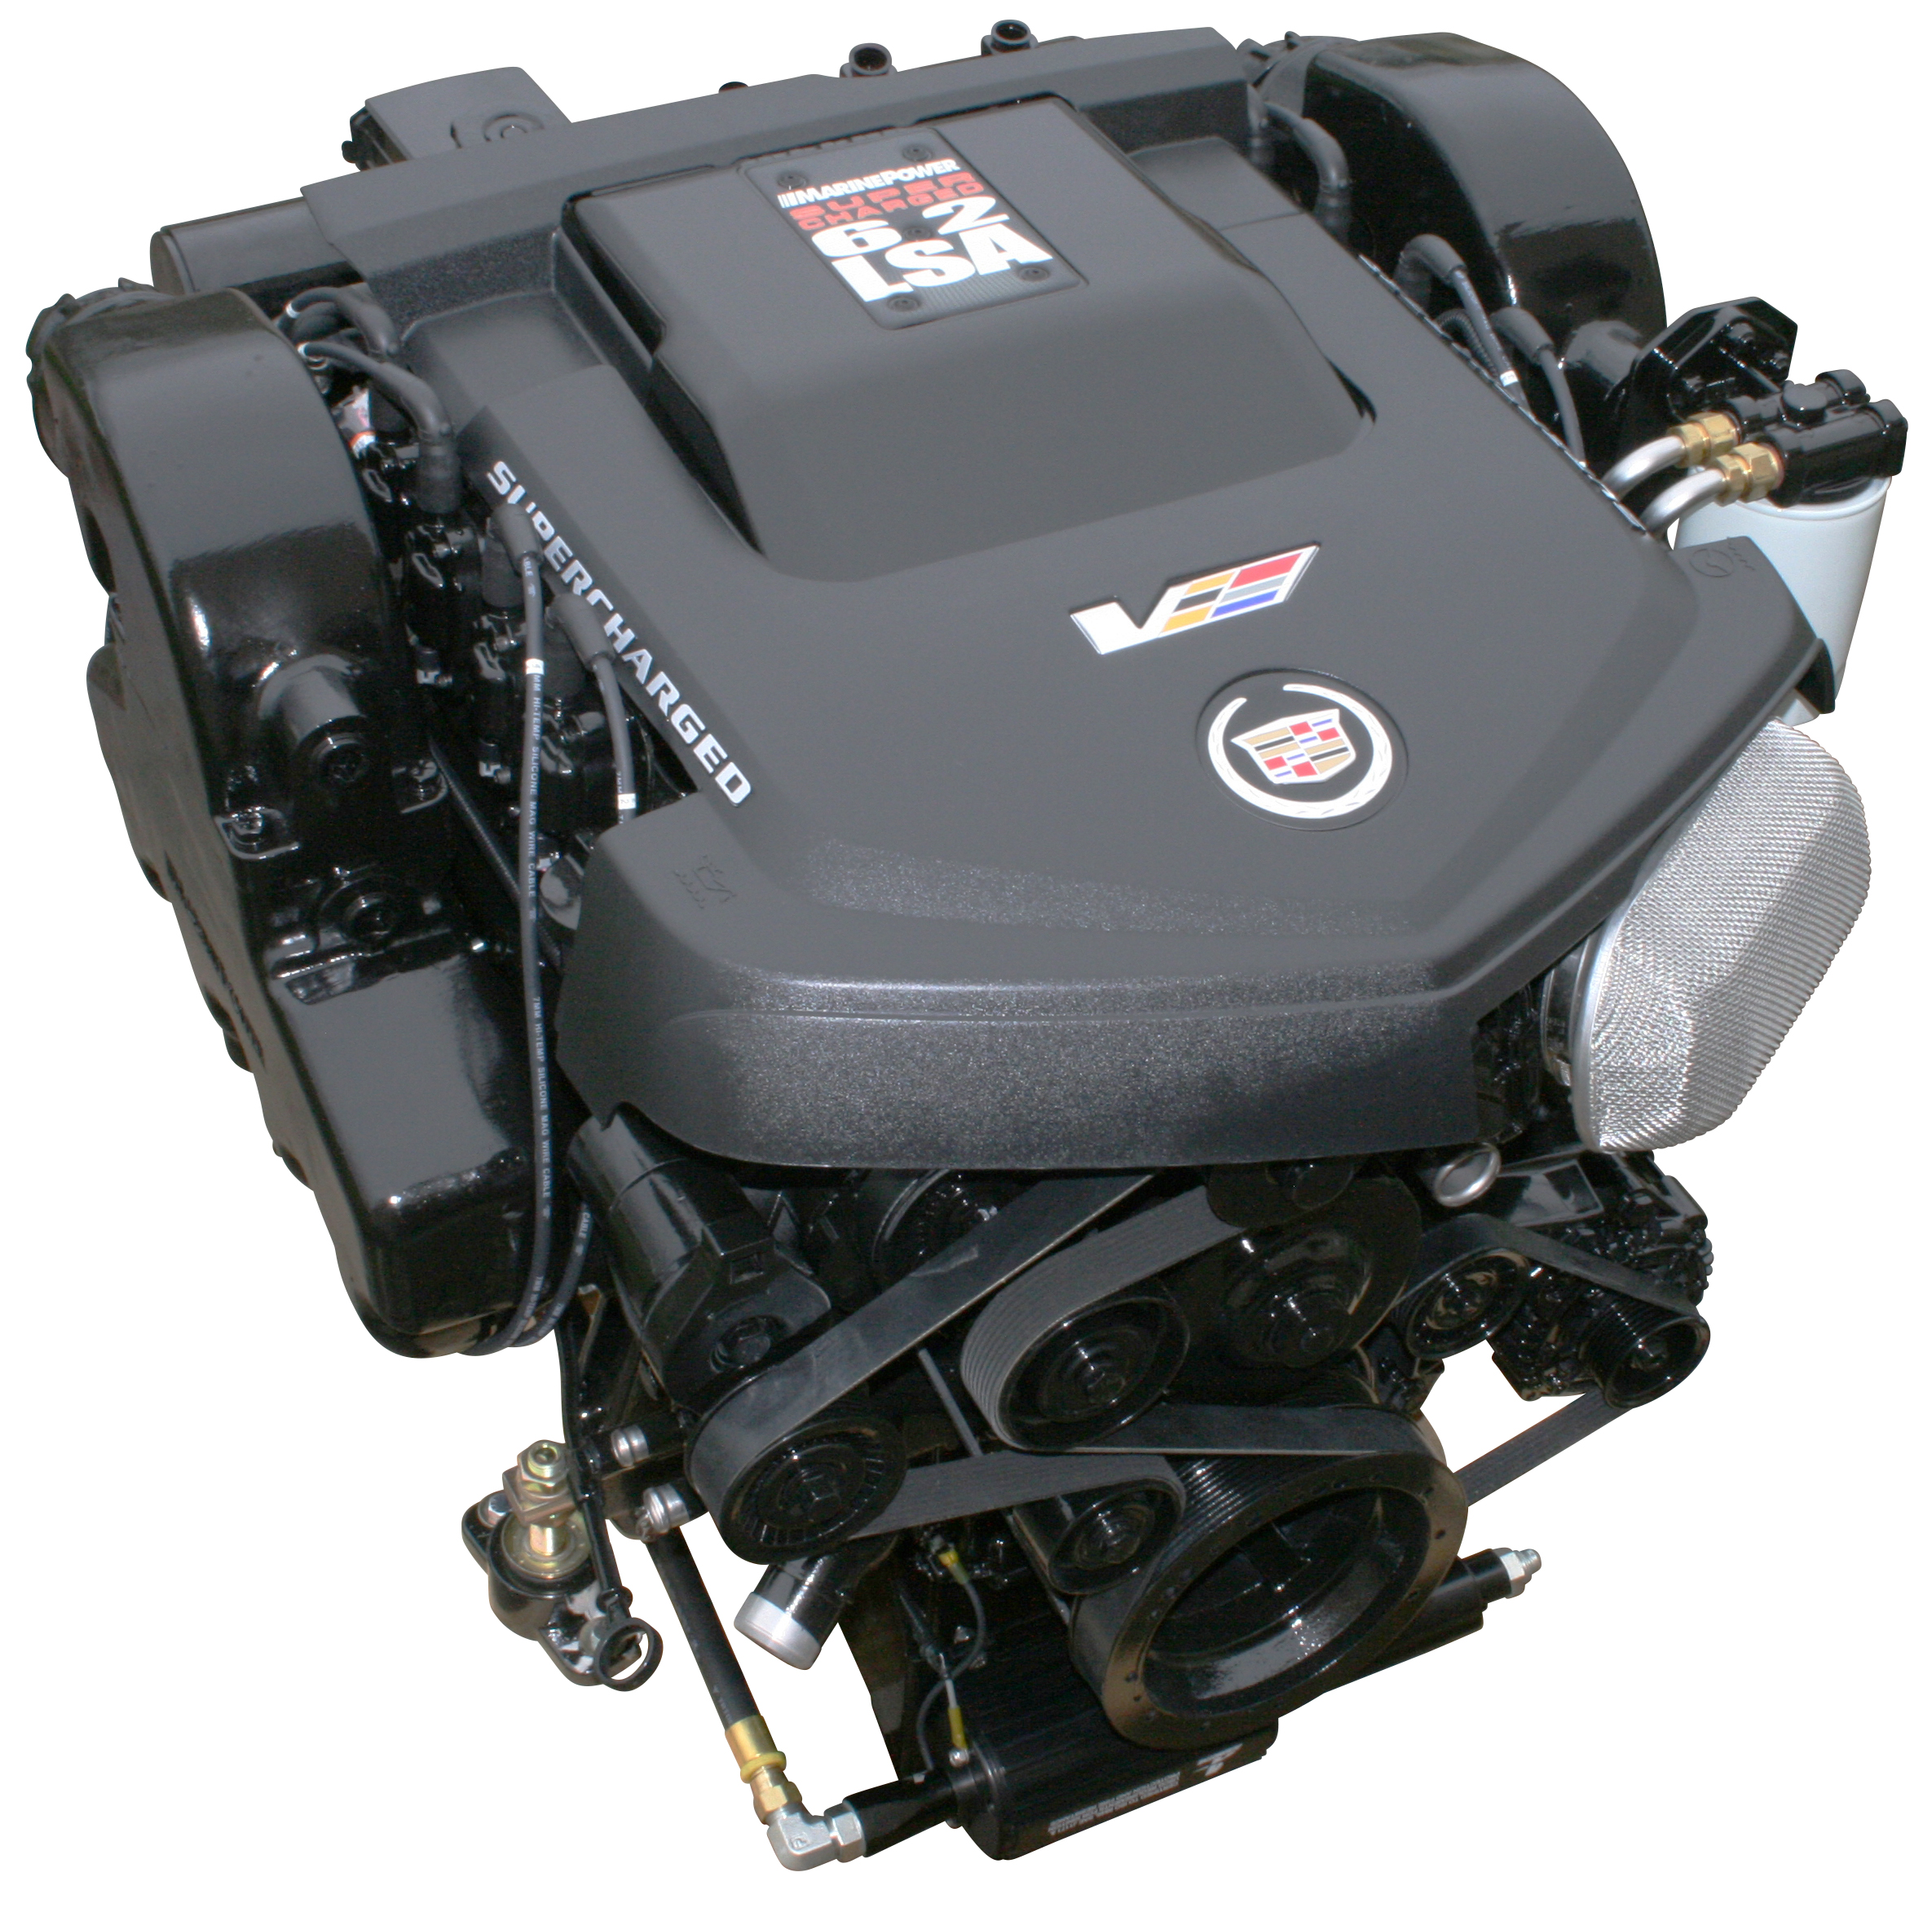 Engine Jet Boat Engine Free Engine Image For User Manual